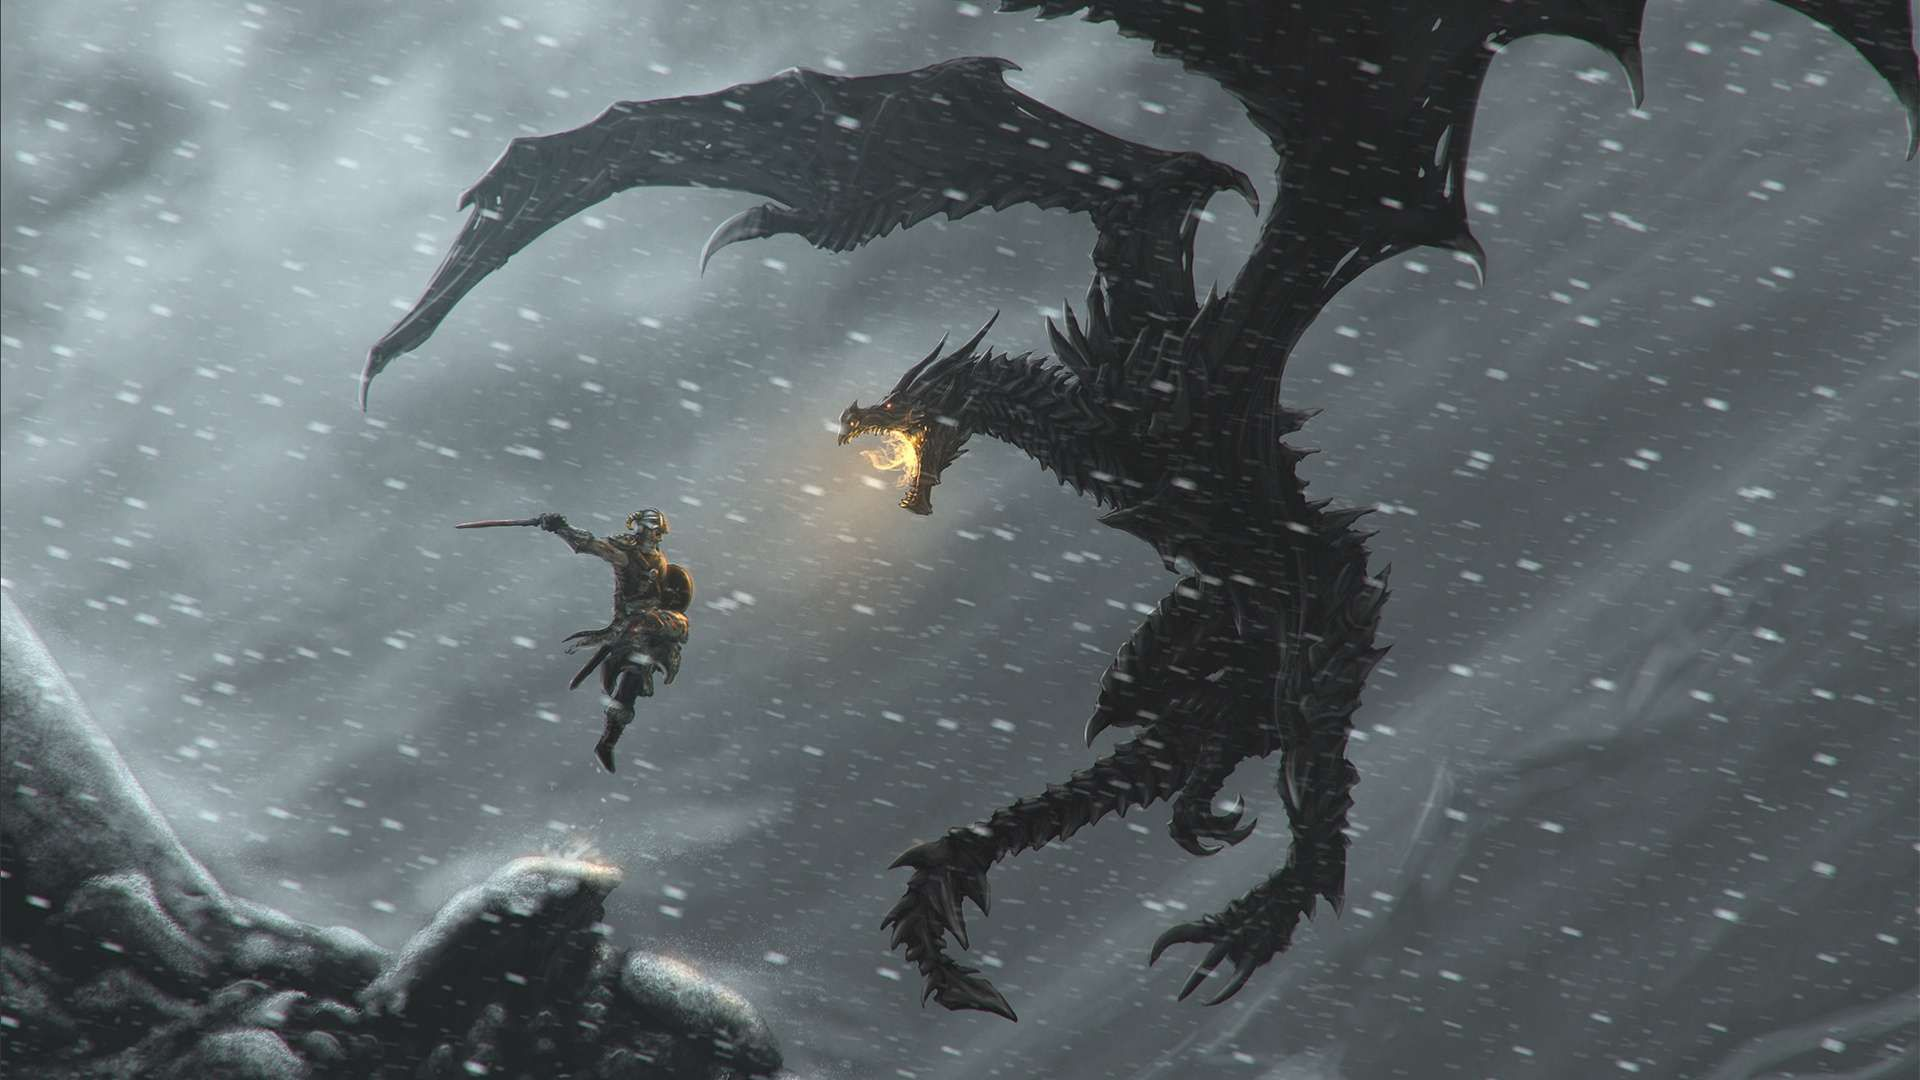 The Elder Scrolls V Skyrim Dragonborn Hd Wallpaper 1080p Skyrim